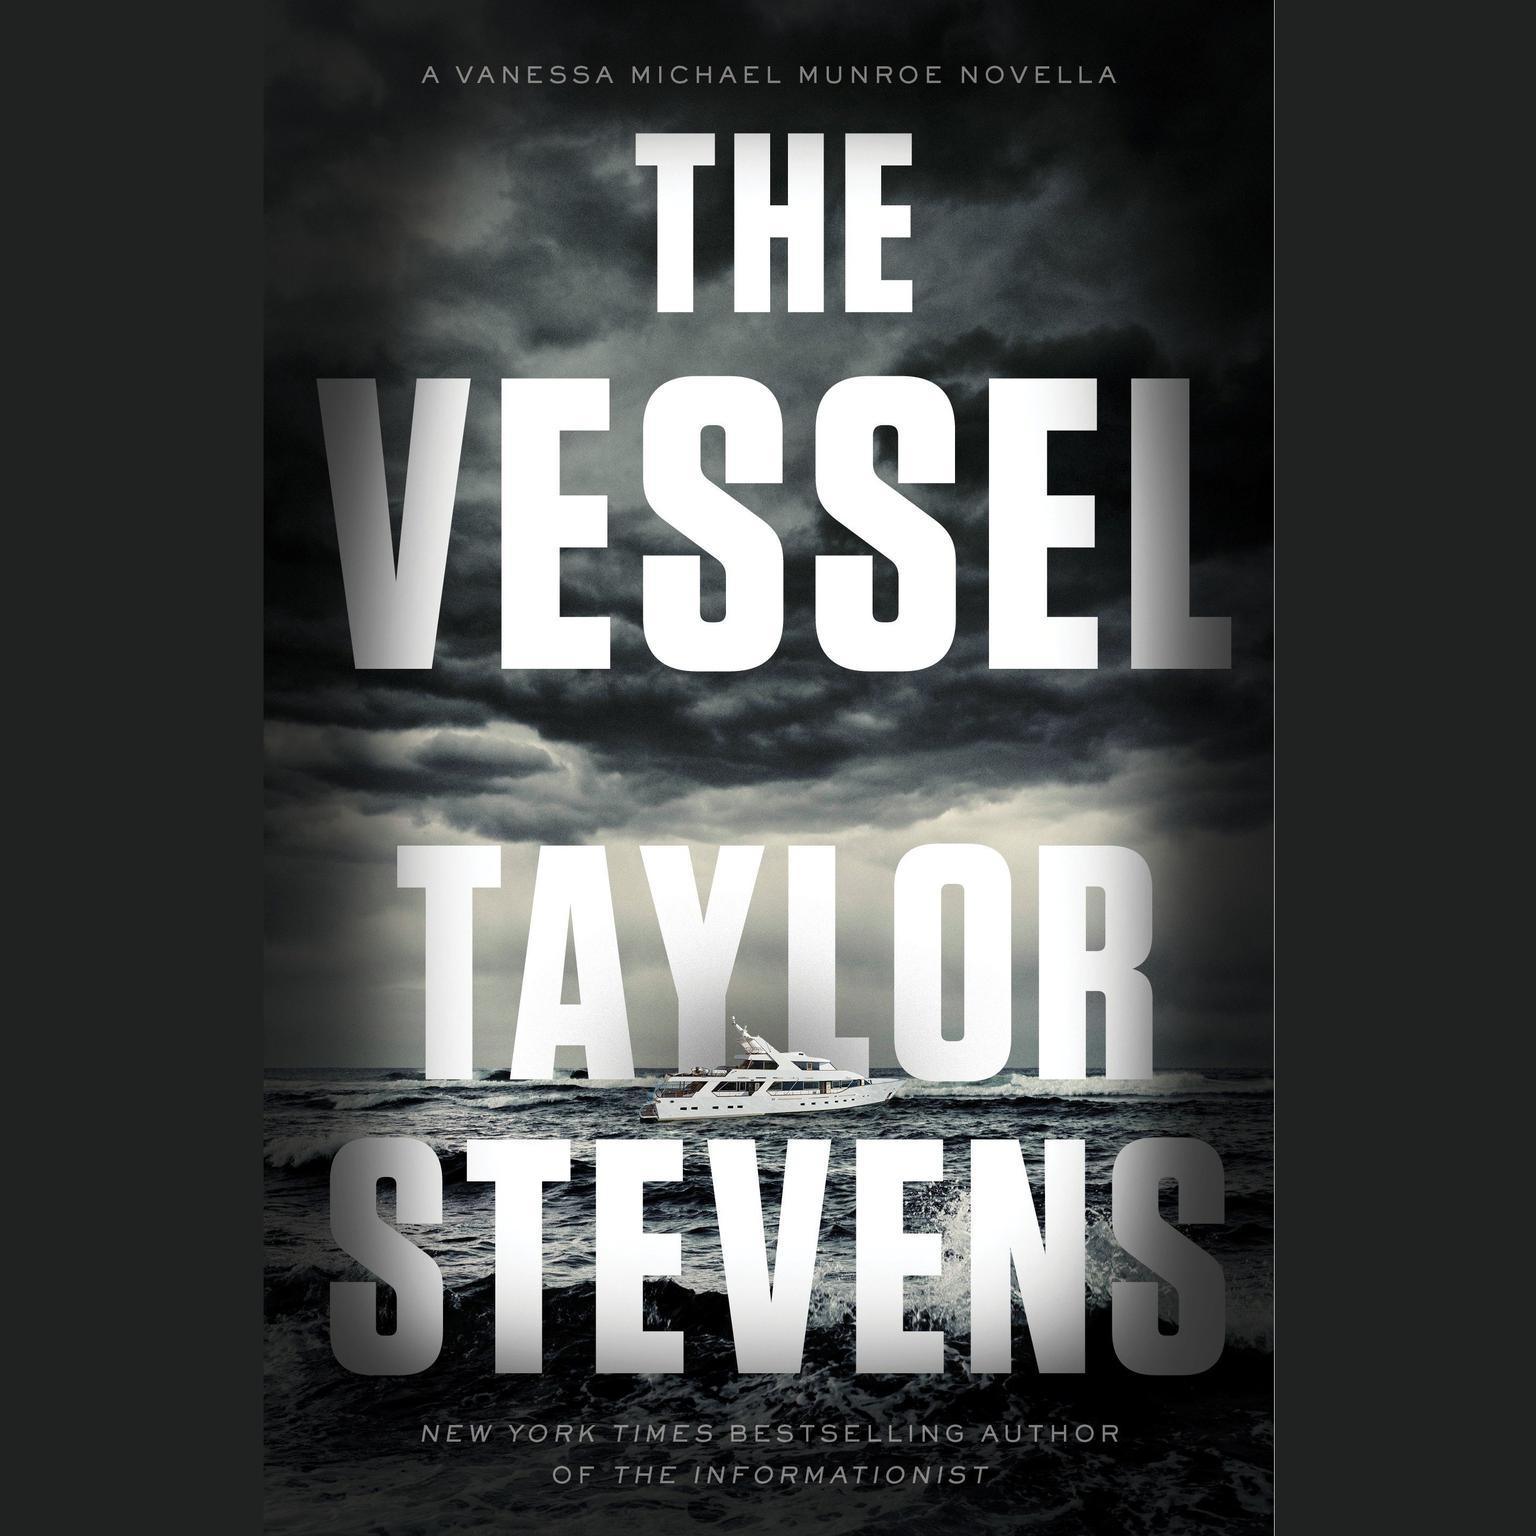 Printable The Vessel: A Vanessa Michael Munroe Novella Audiobook Cover Art